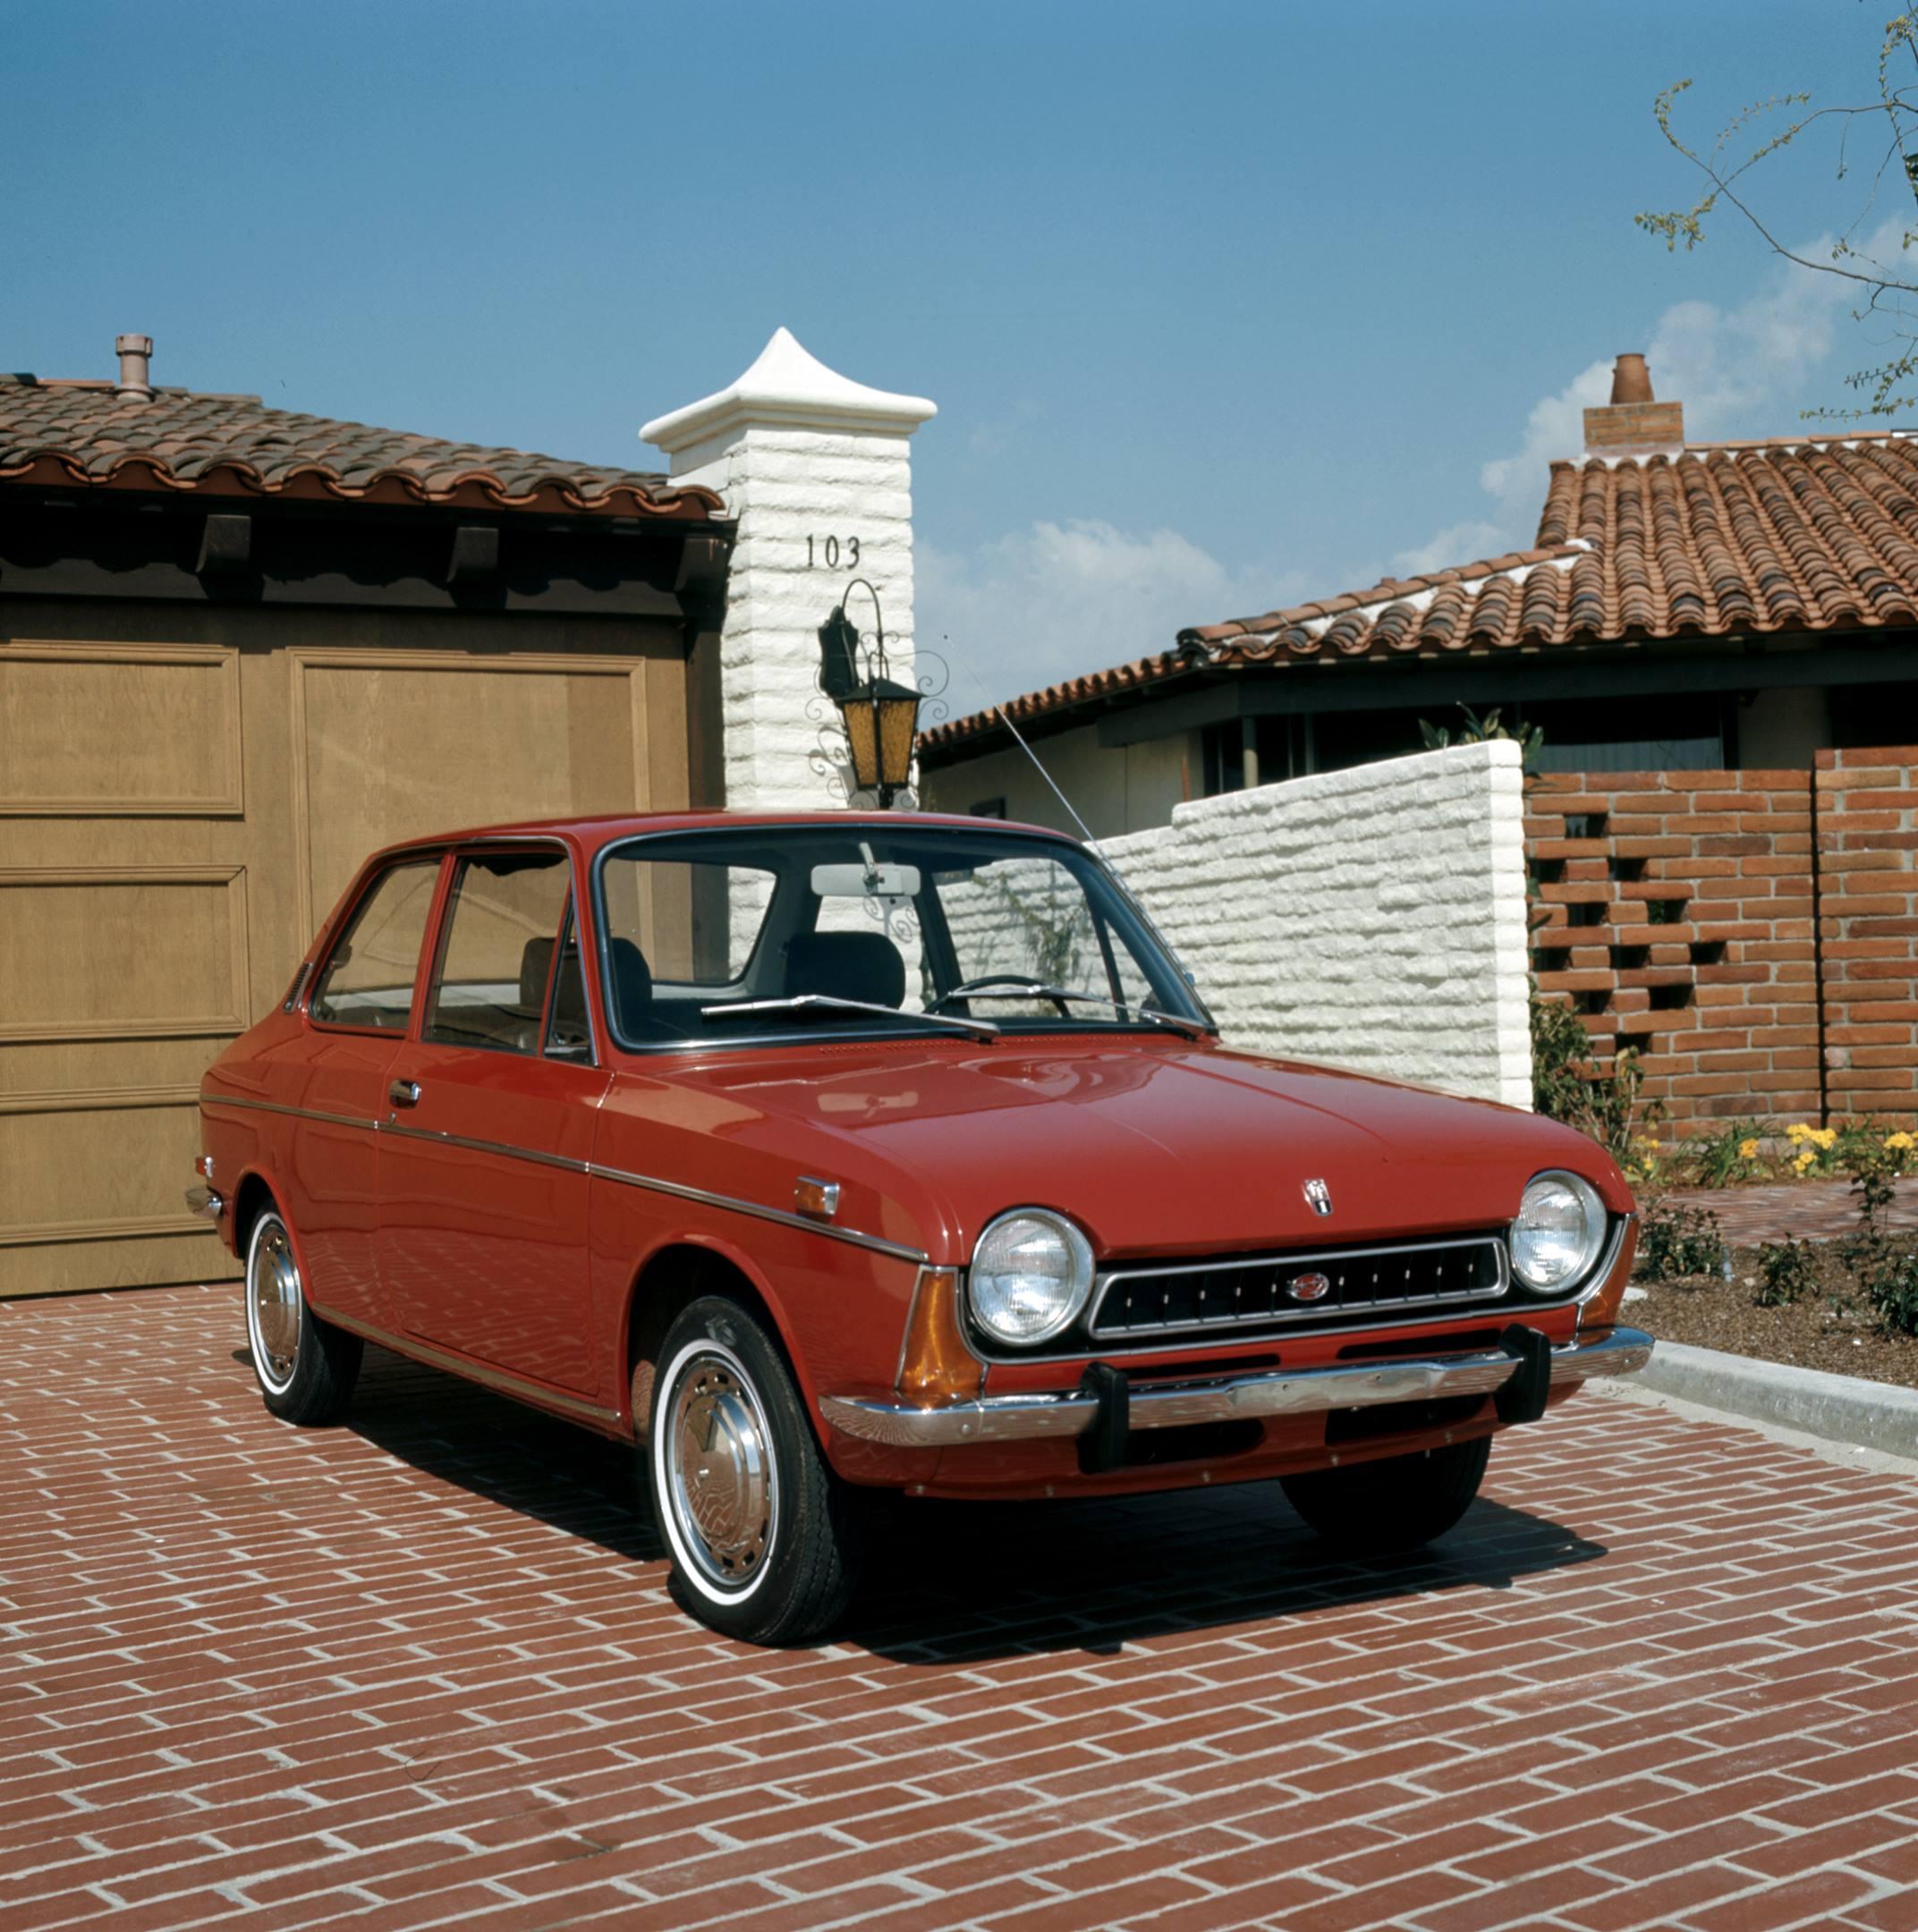 1970 Subaru FF-1 two-door